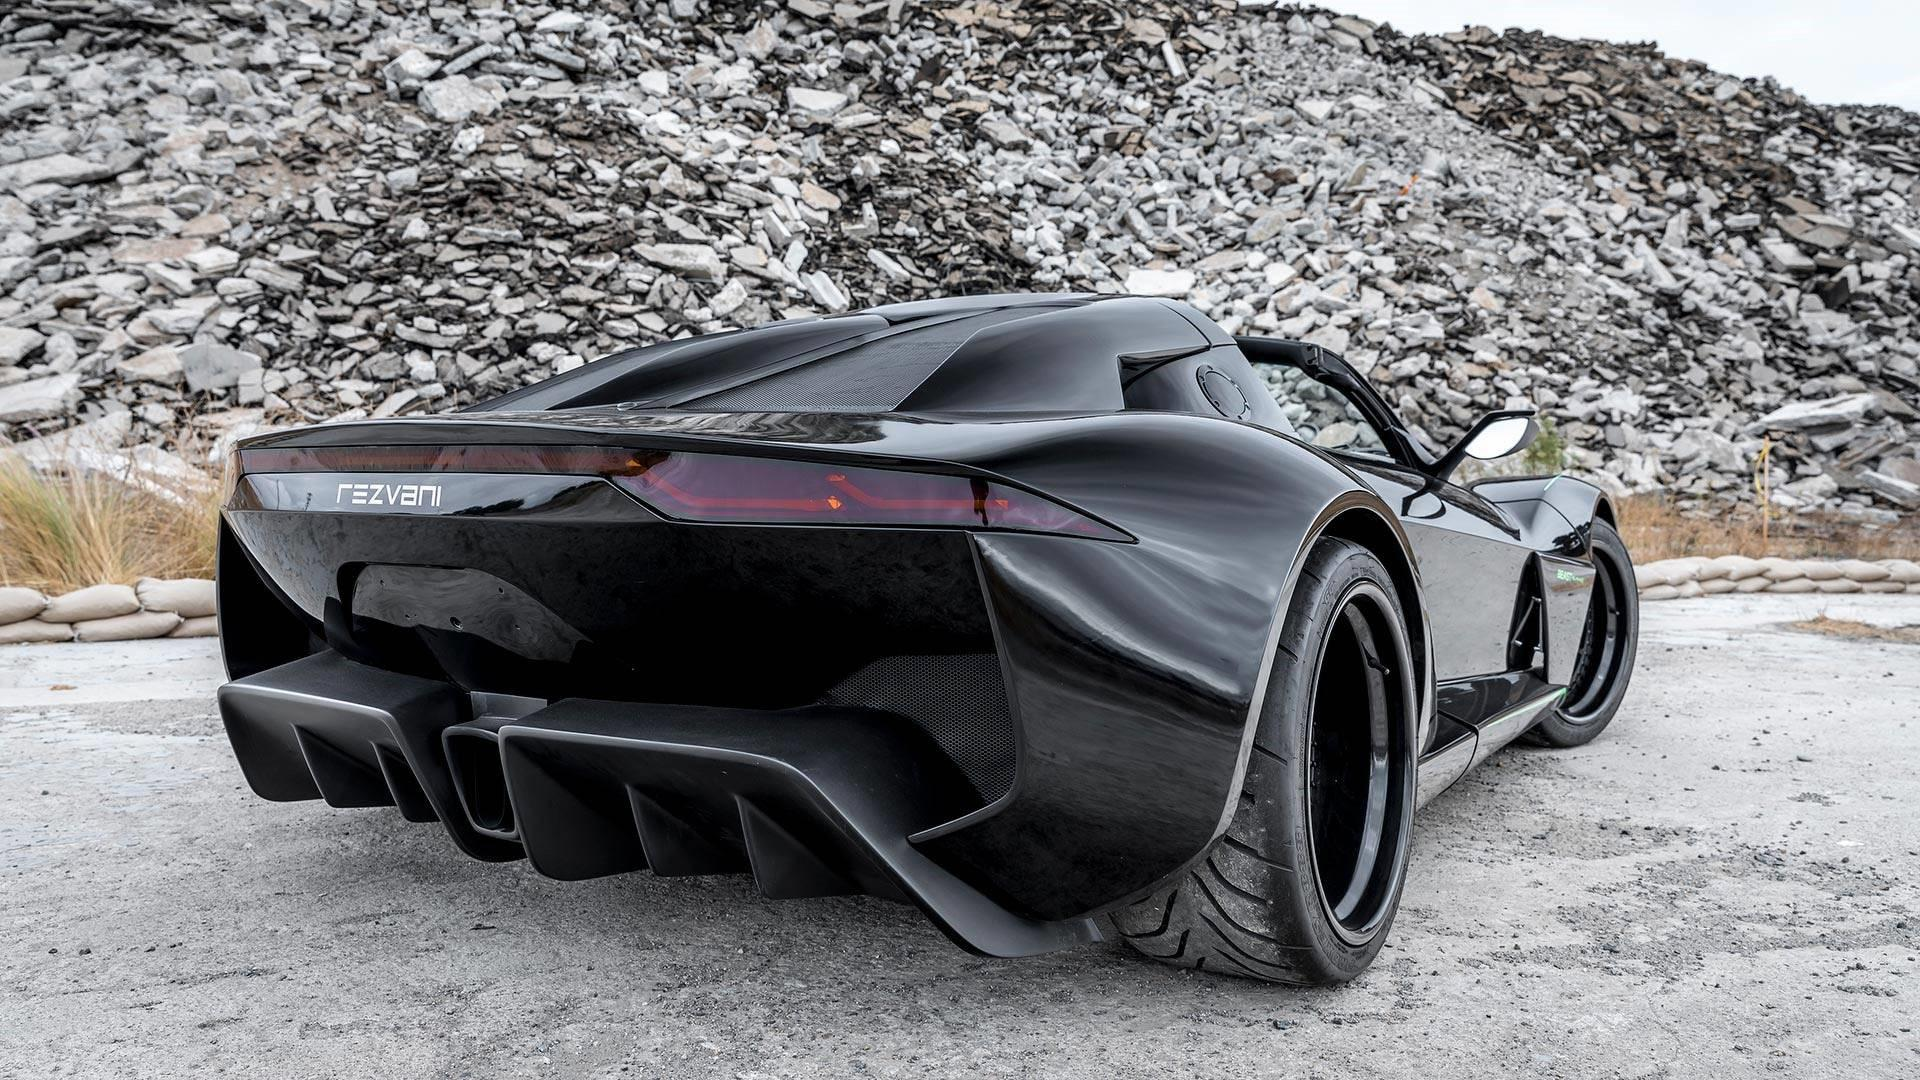 rezvani-beast-alpha-x-blackbird-une-production-limitee-a-5-exemplaires-622-3-1.jpg